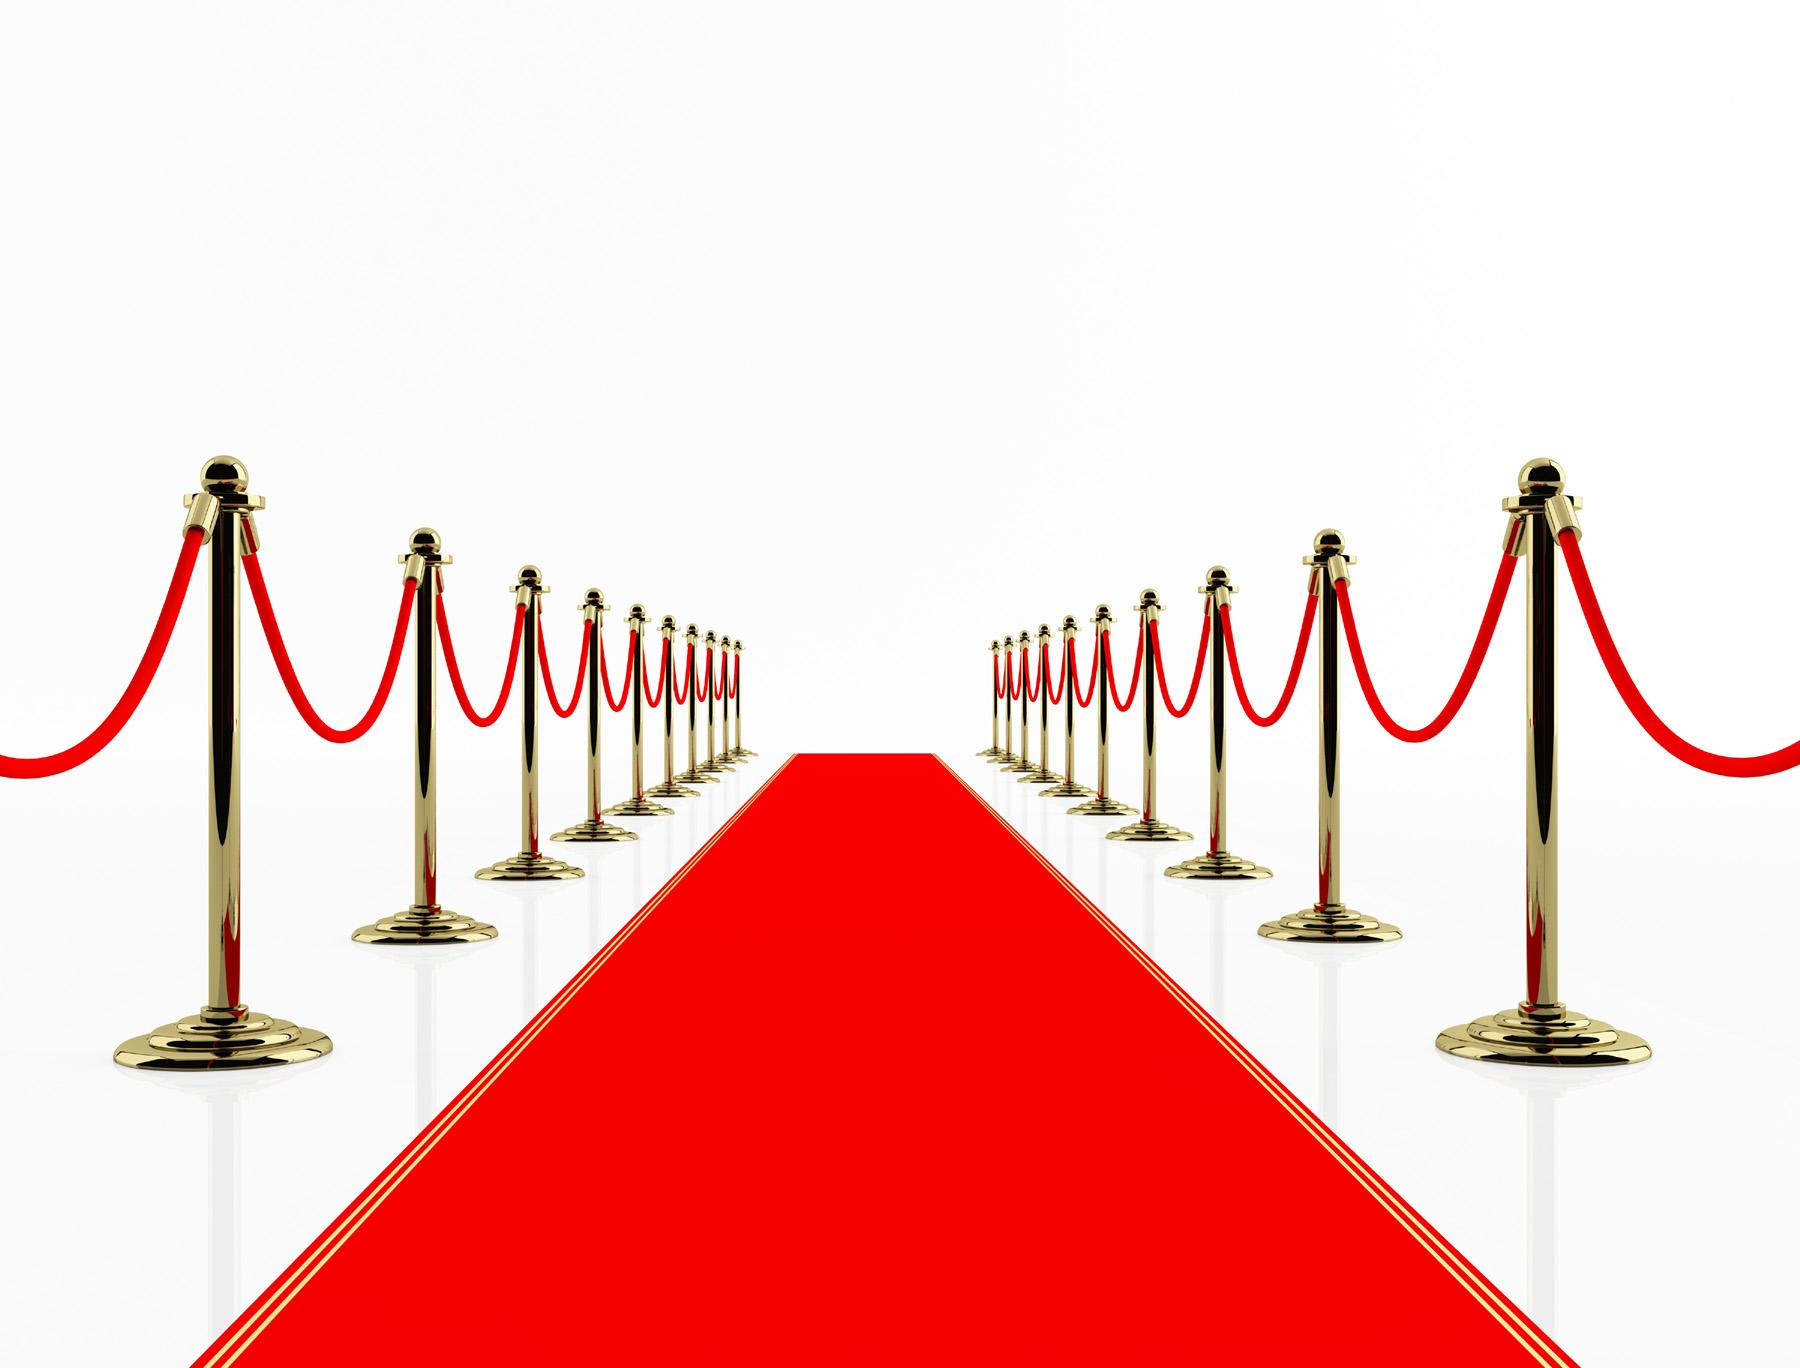 Red Carpet Hd Wallpaper 1800x1368